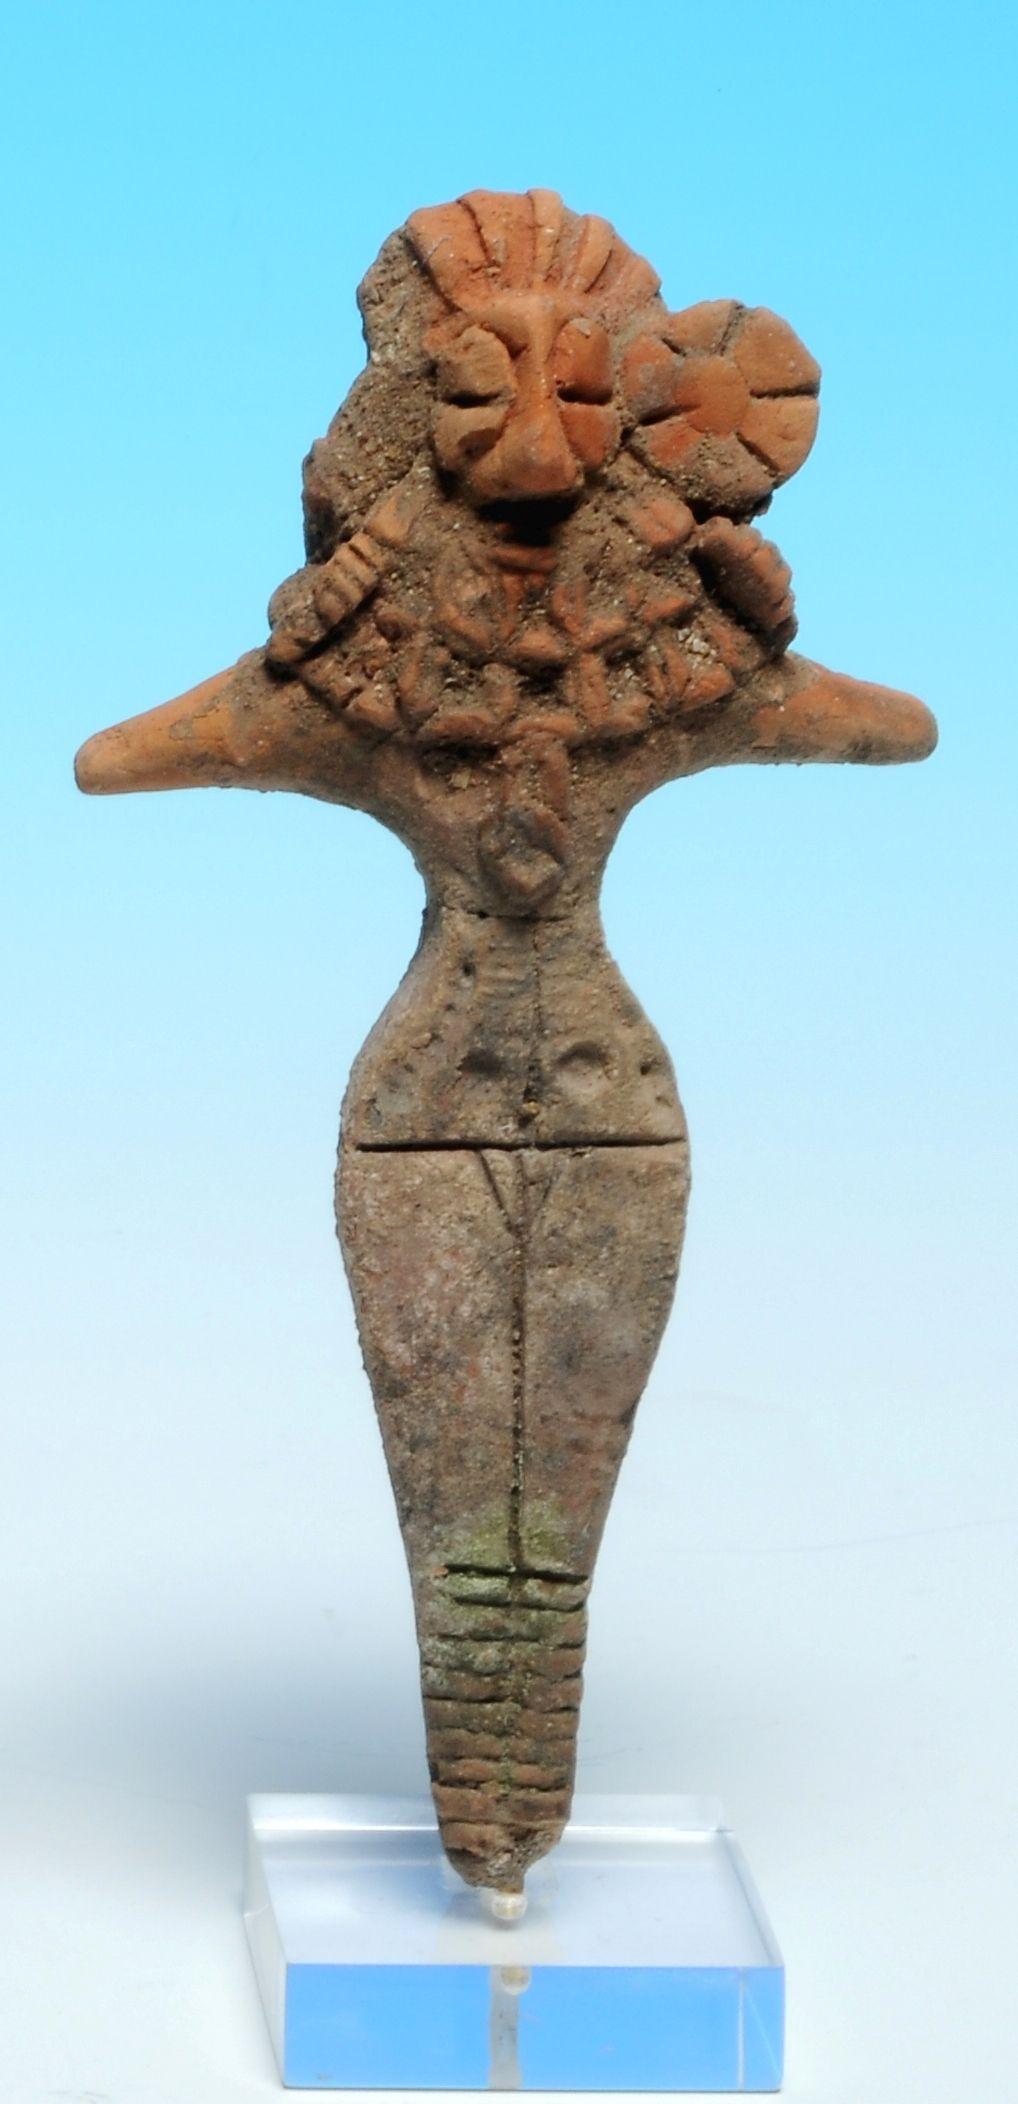 A Terracotta Figurine Balucistan 3rd Millennium Bc Arte Prehistorico Arte Antiguo Arte Tribal